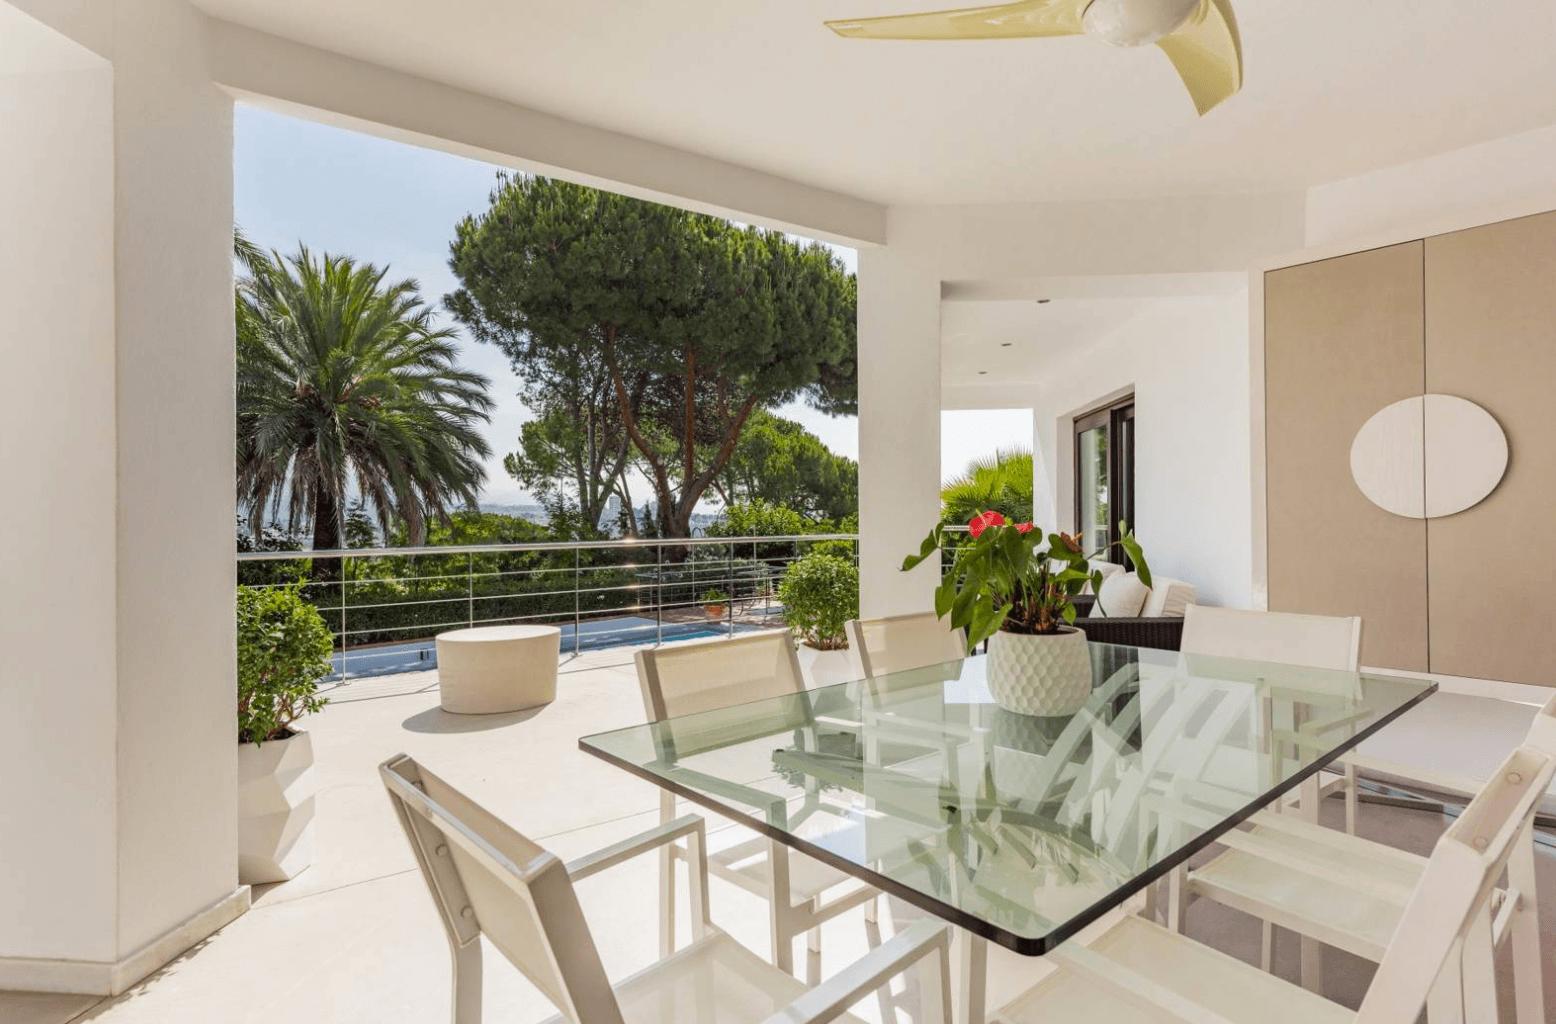 nueva andalucia modern villa with roof terrace. Black Bedroom Furniture Sets. Home Design Ideas